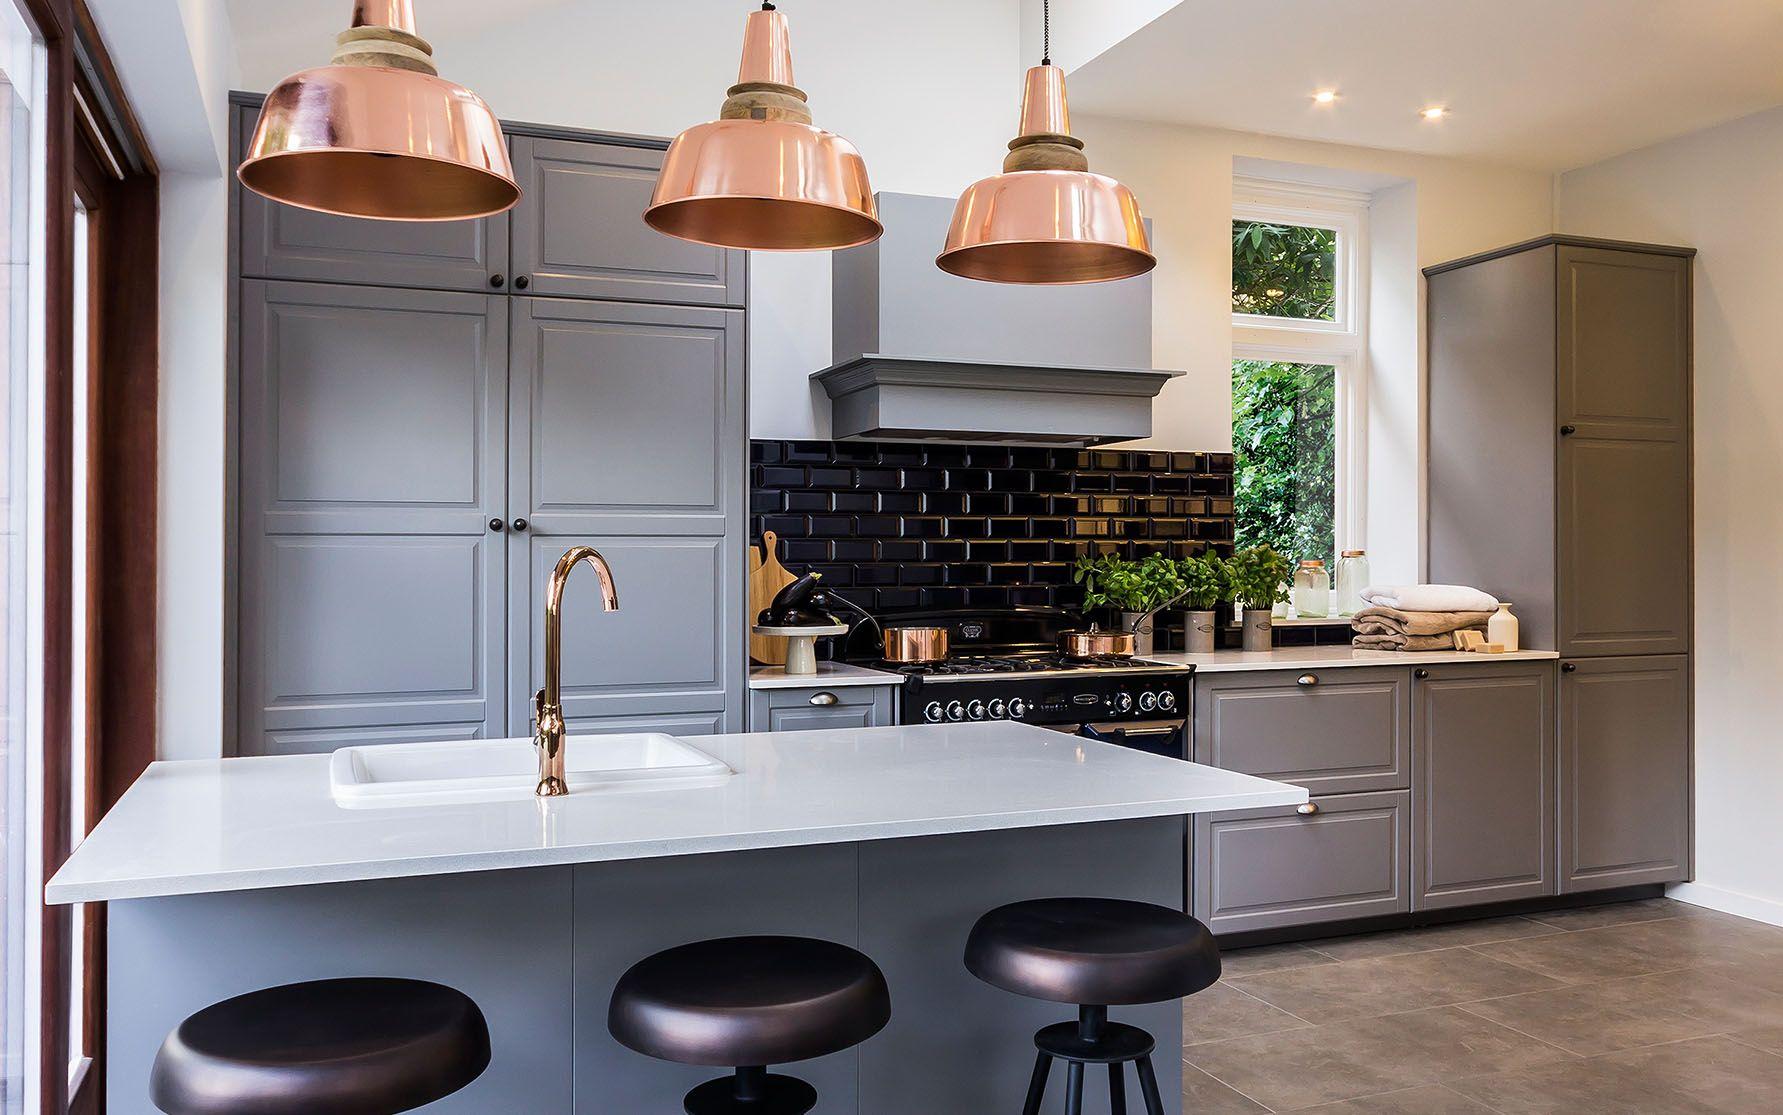 Interior Design London - LLI Design - Highgate - North London ...